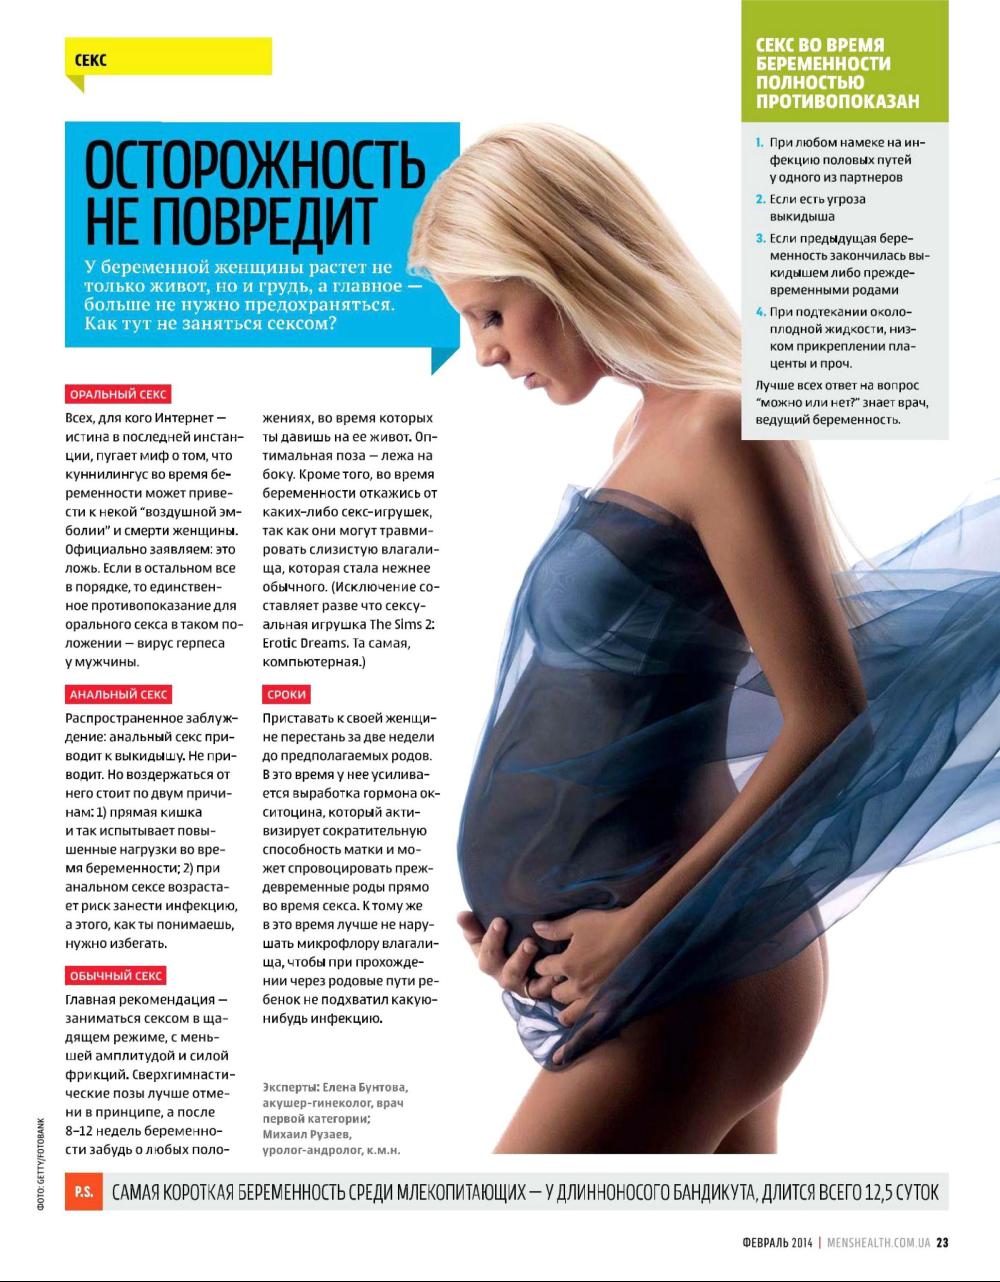 http://i6.imageban.ru/out/2014/01/15/6f6963b28b6a769dec1fc03261c59c5d.jpg